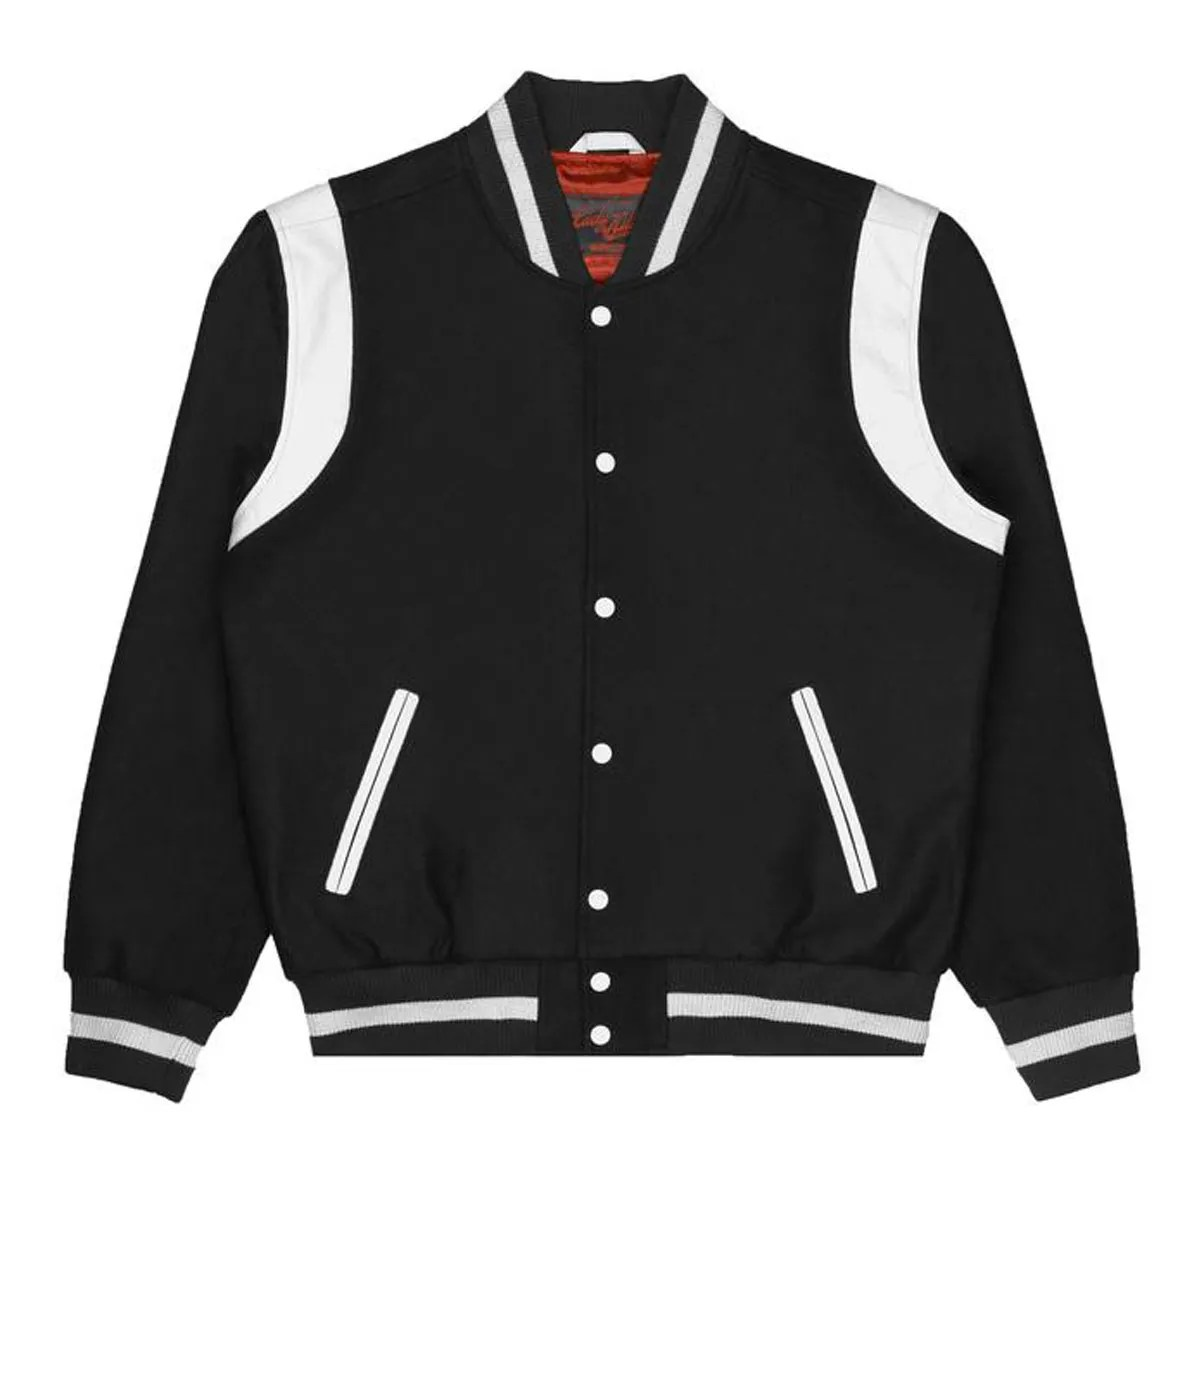 g-eazy-lady-killers-jacket